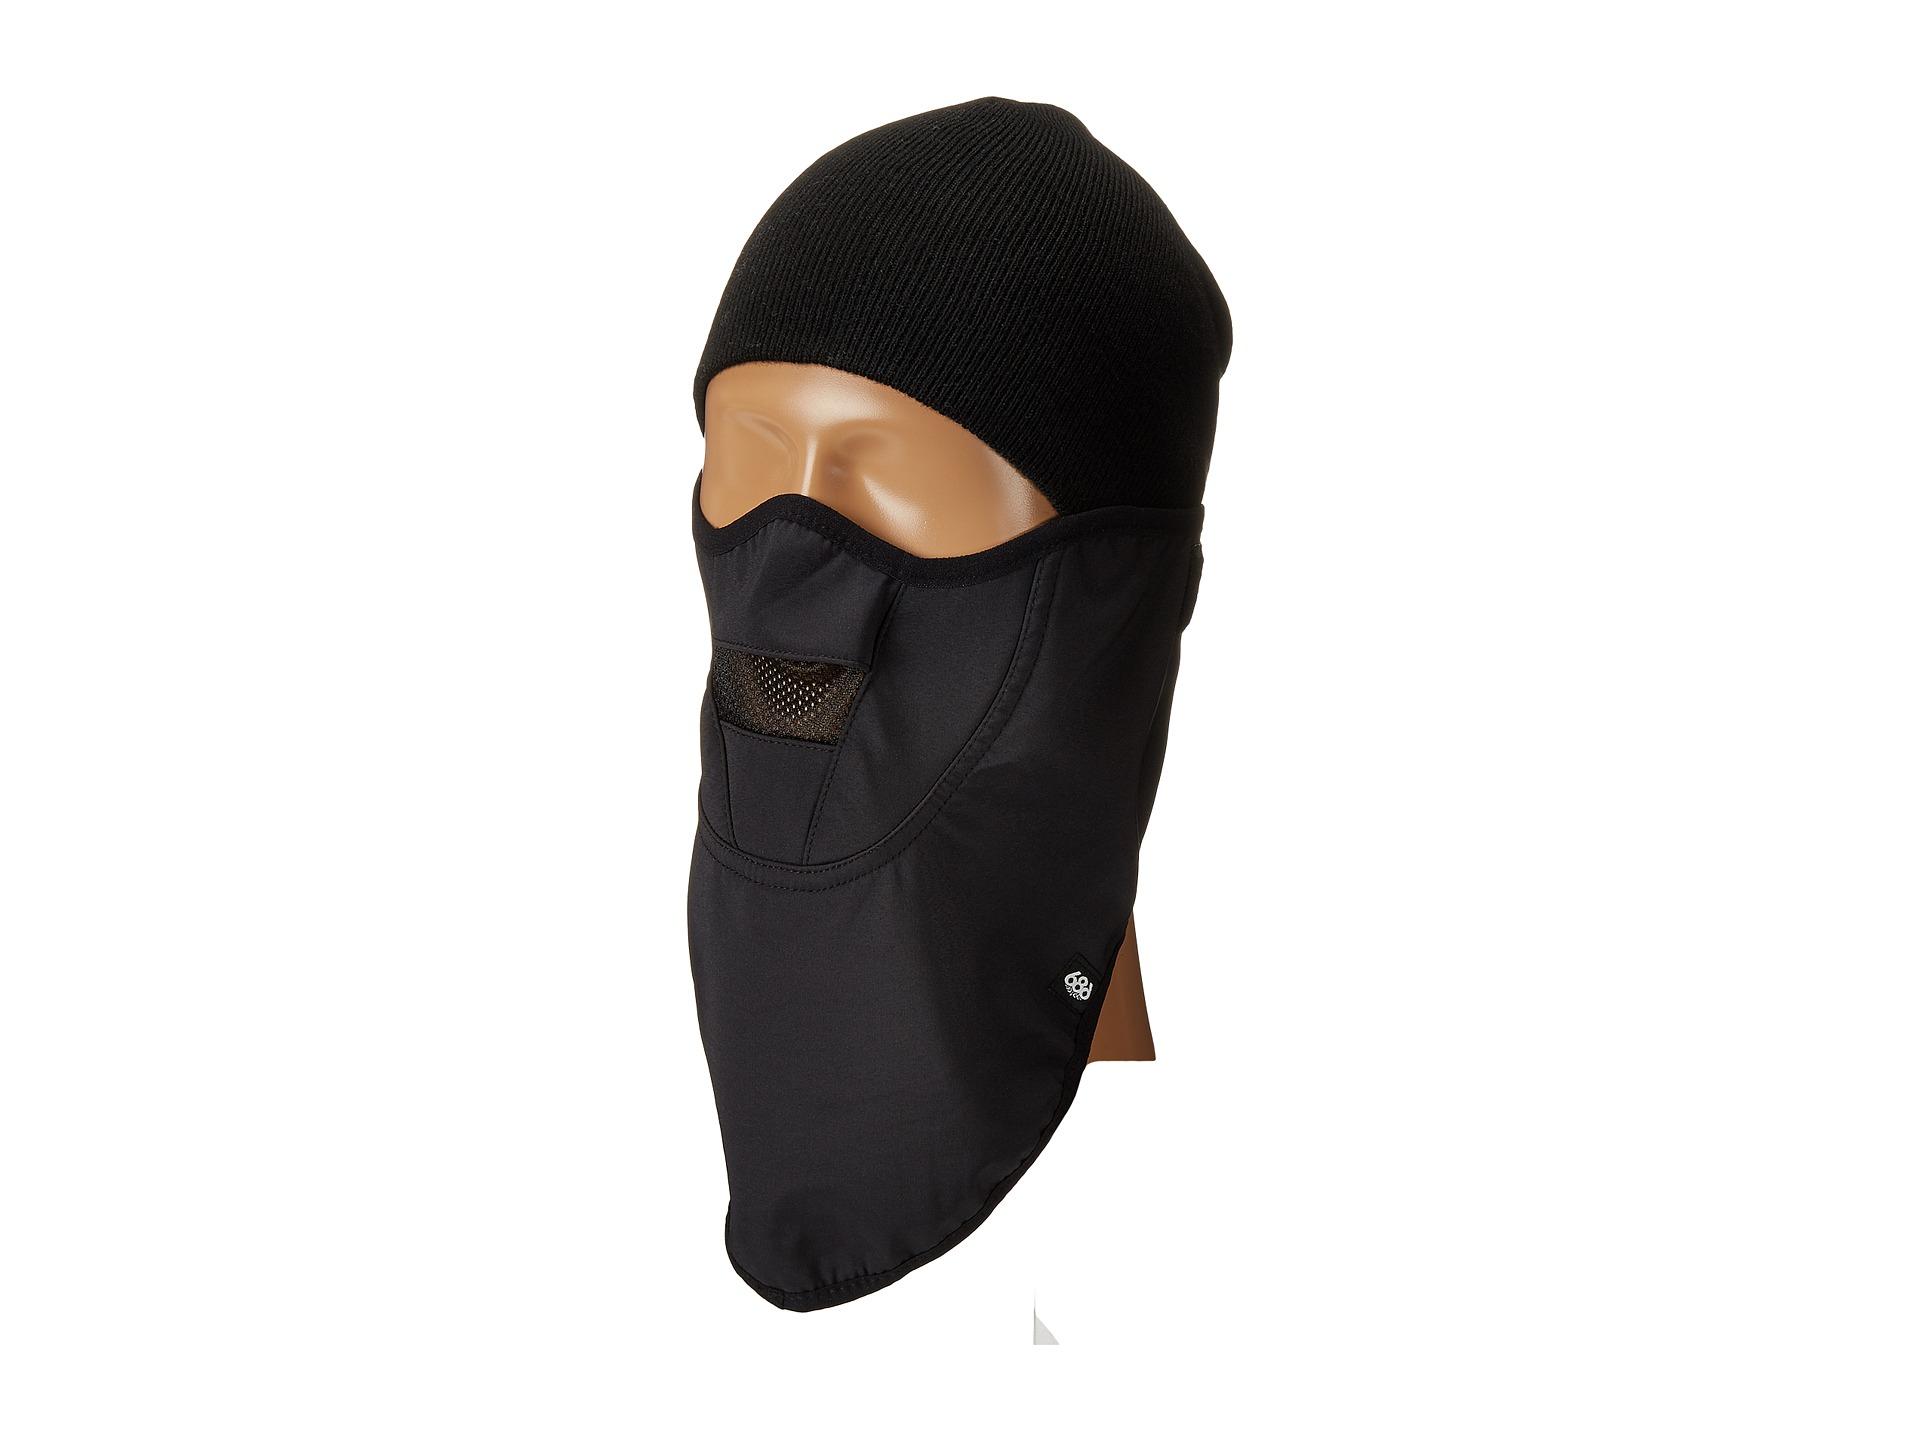 2088b23023c9 TYR Magna Swim Mask Black on PopScreen